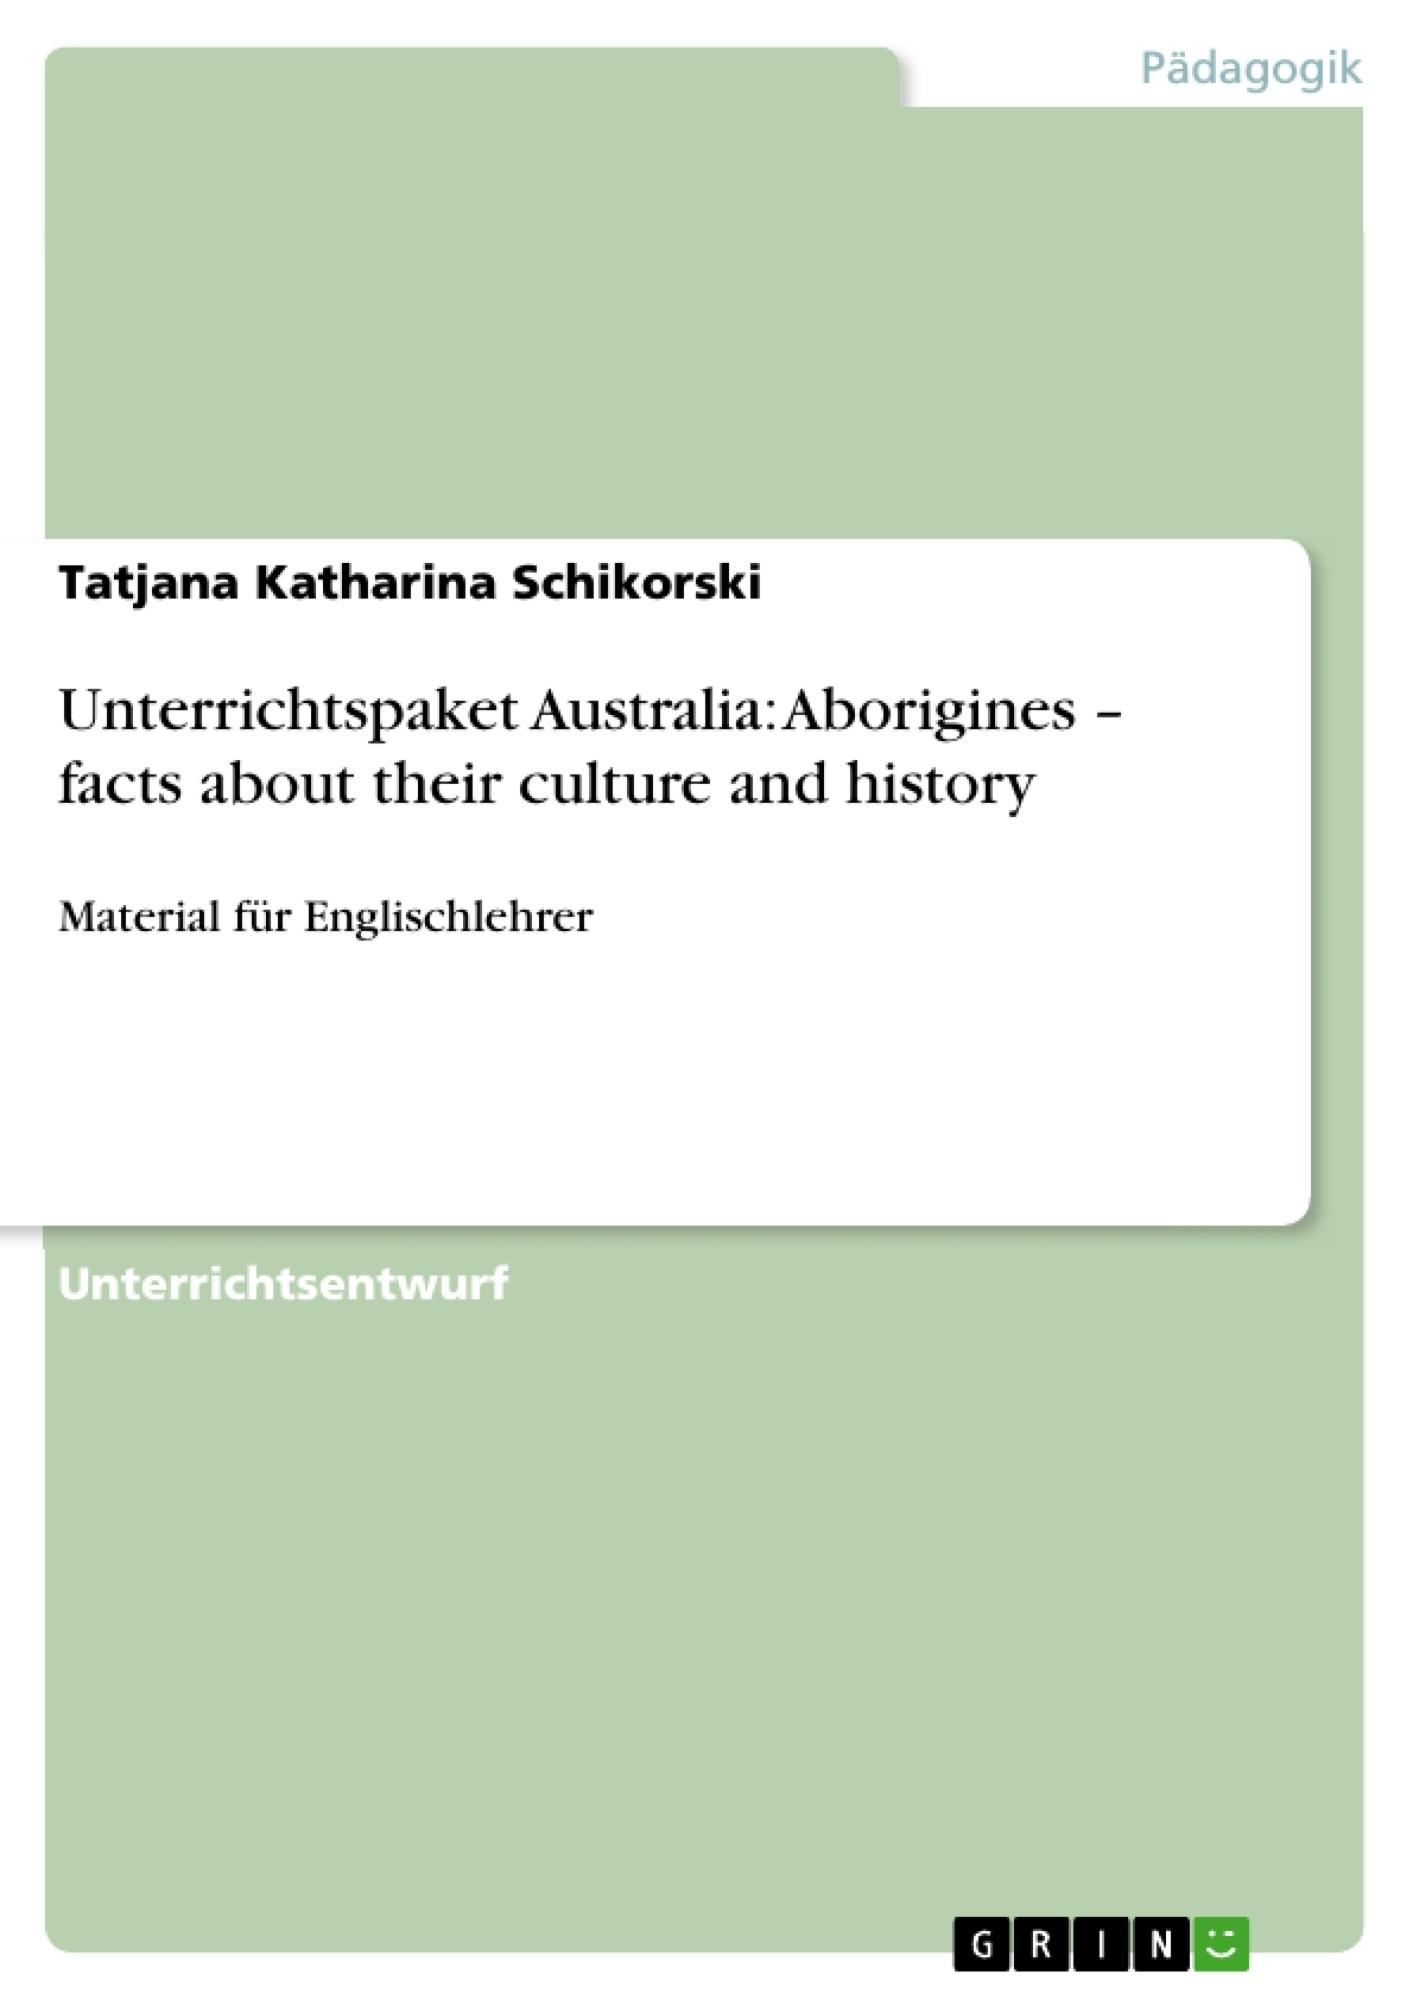 Titel: Unterrichtspaket Australia: Aborigines – facts about their culture and history